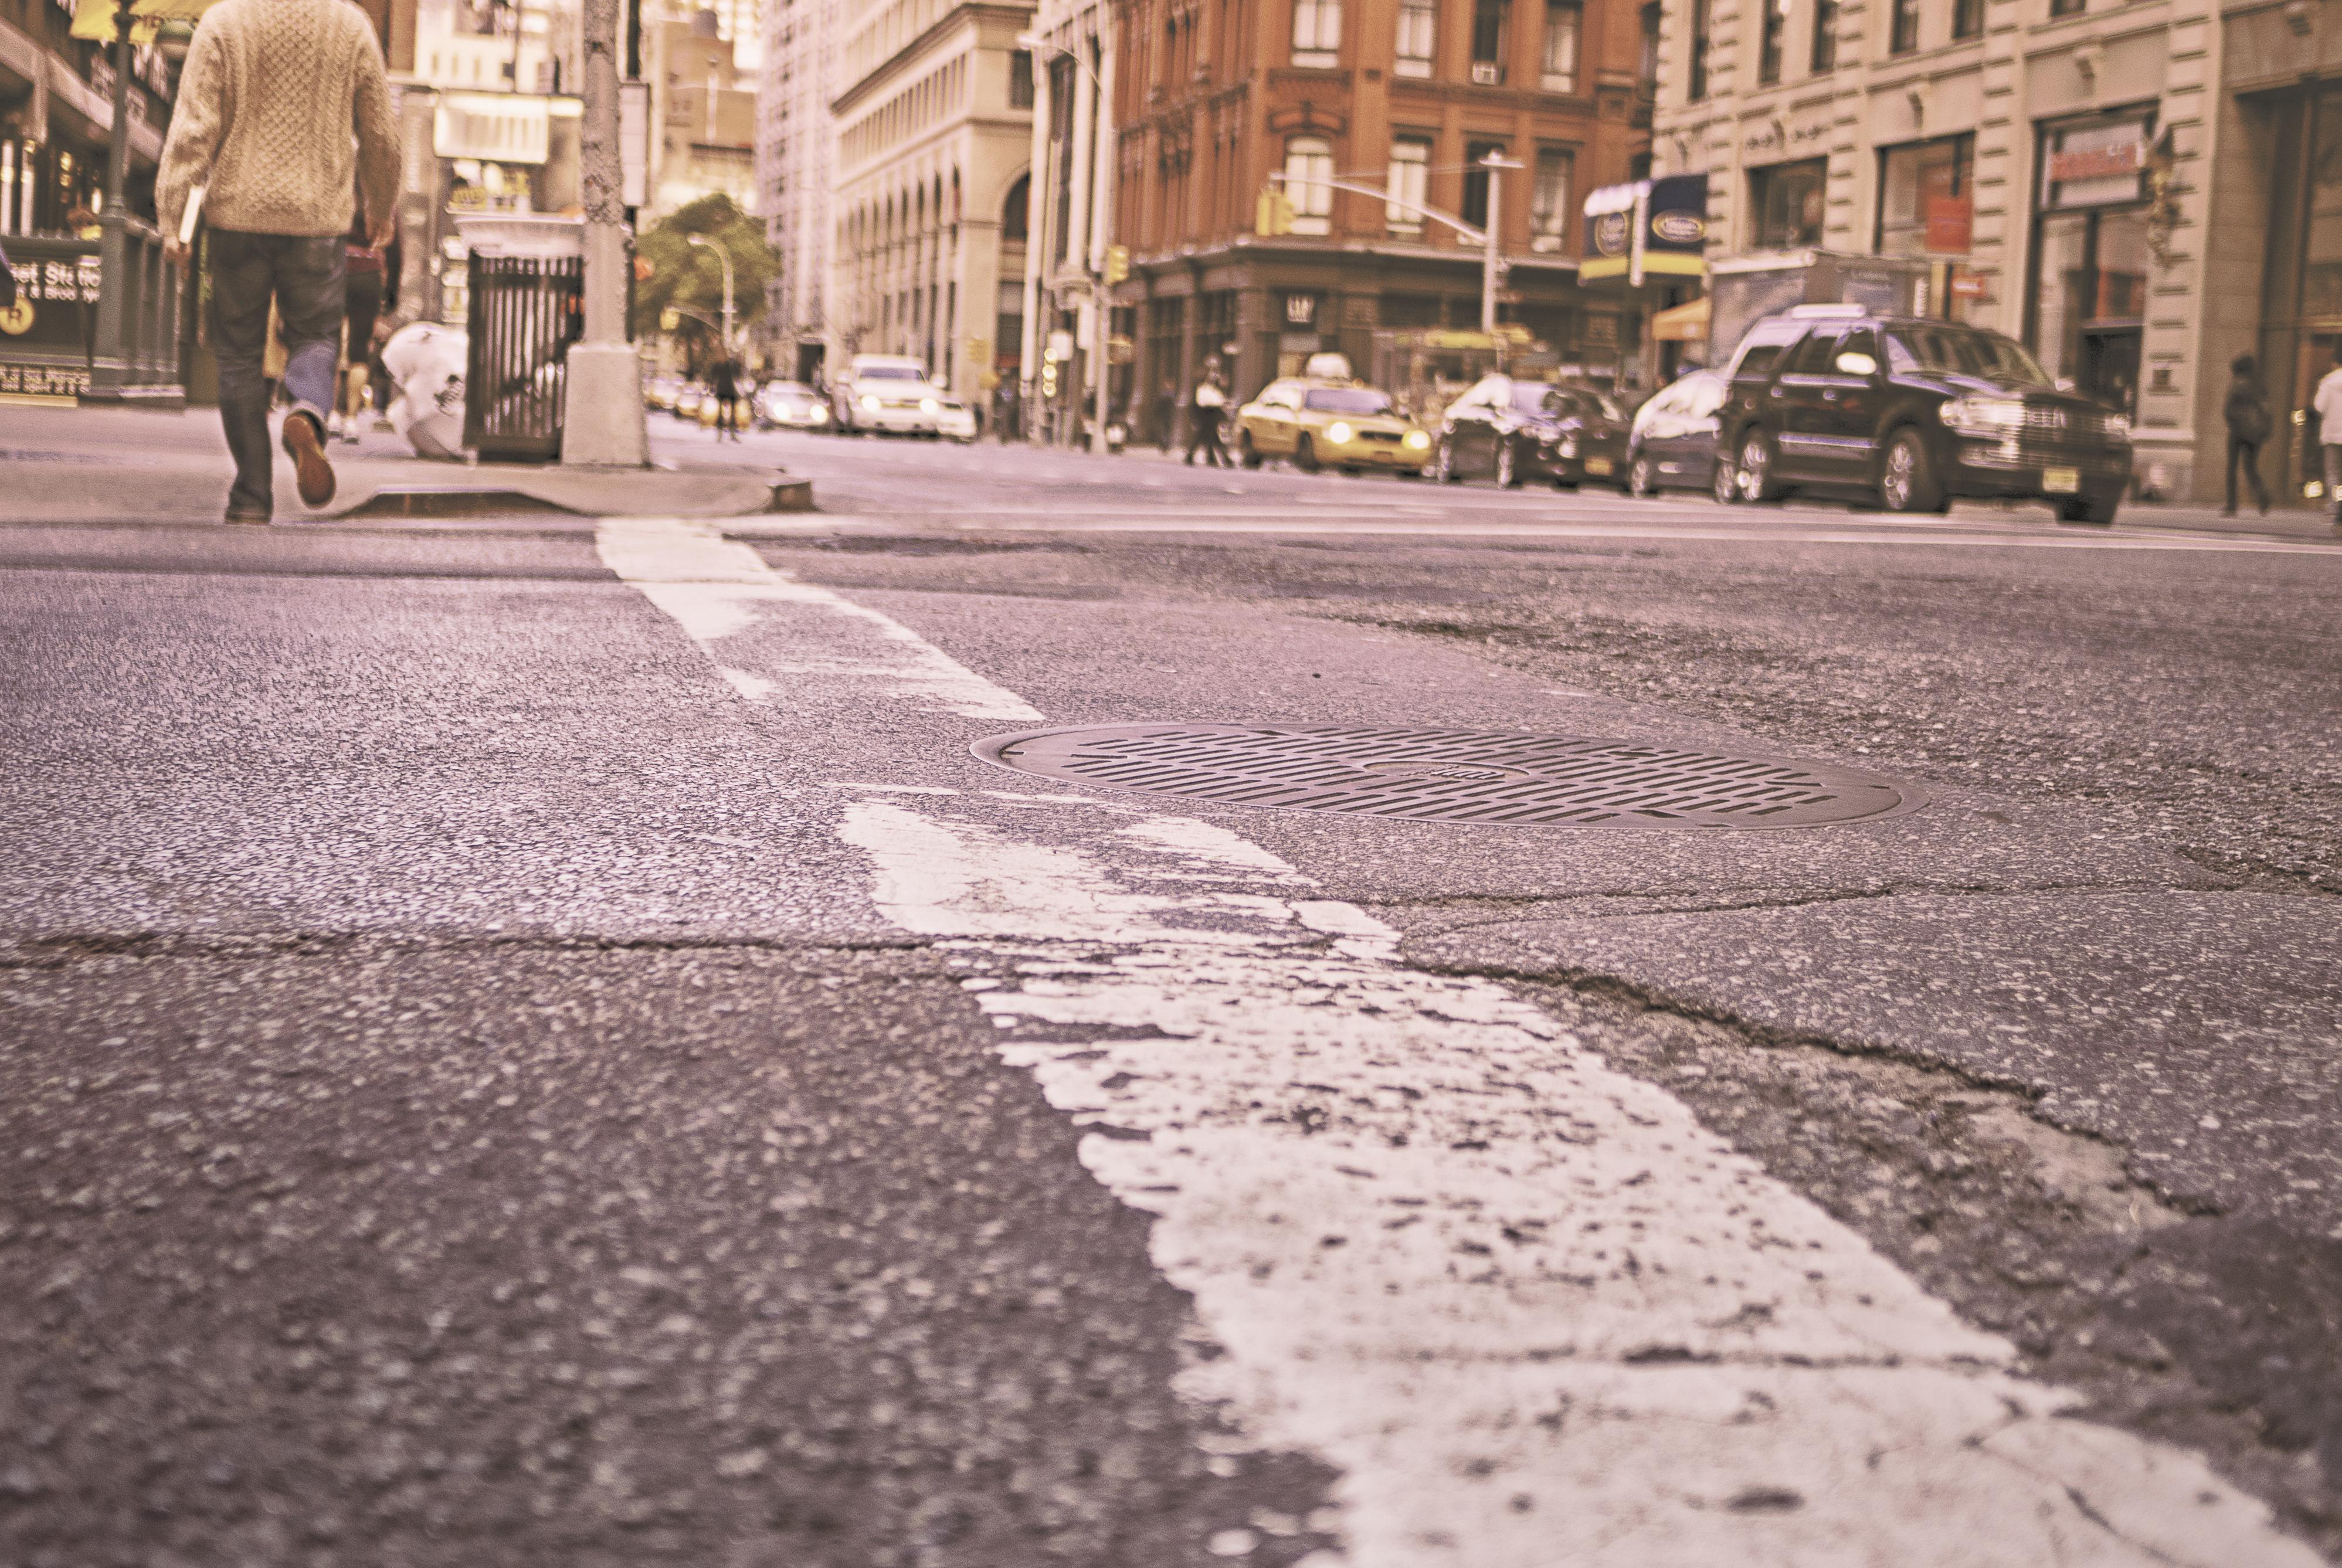 city-crossing-crossroad-road.jpg